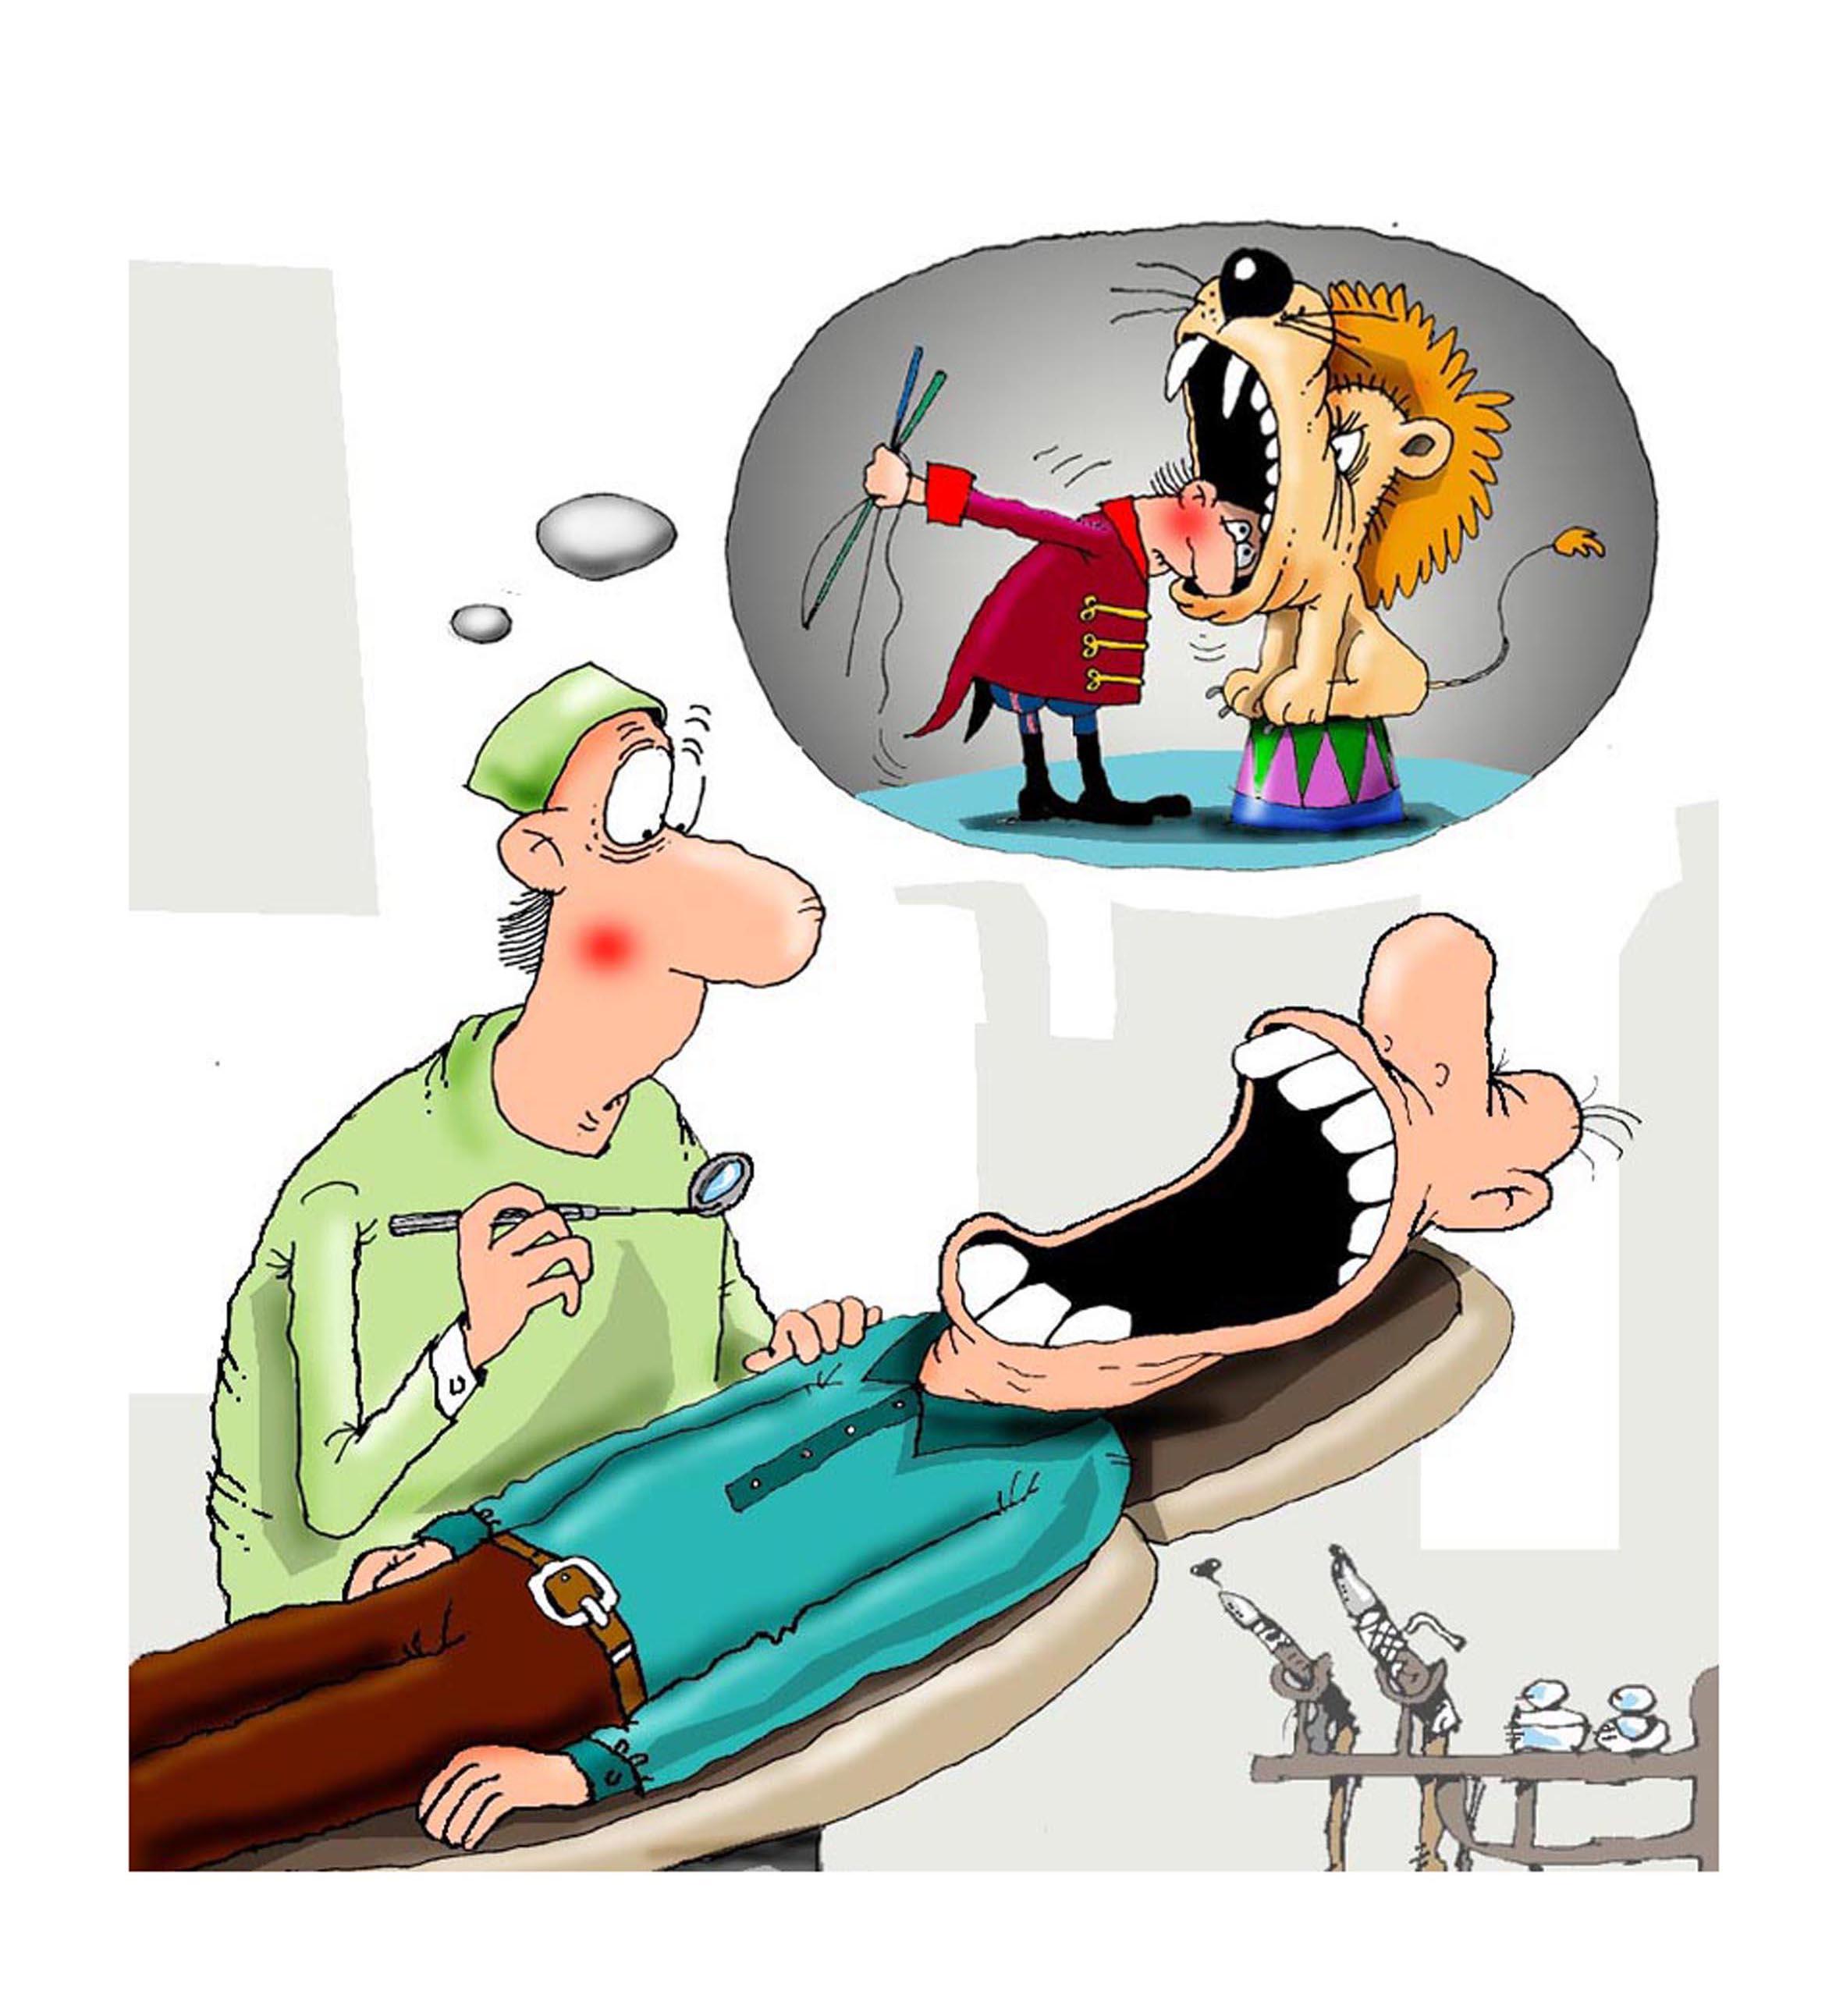 Смешные картинки про стоматологов смешные картинки про стоматологов, картинки пришла